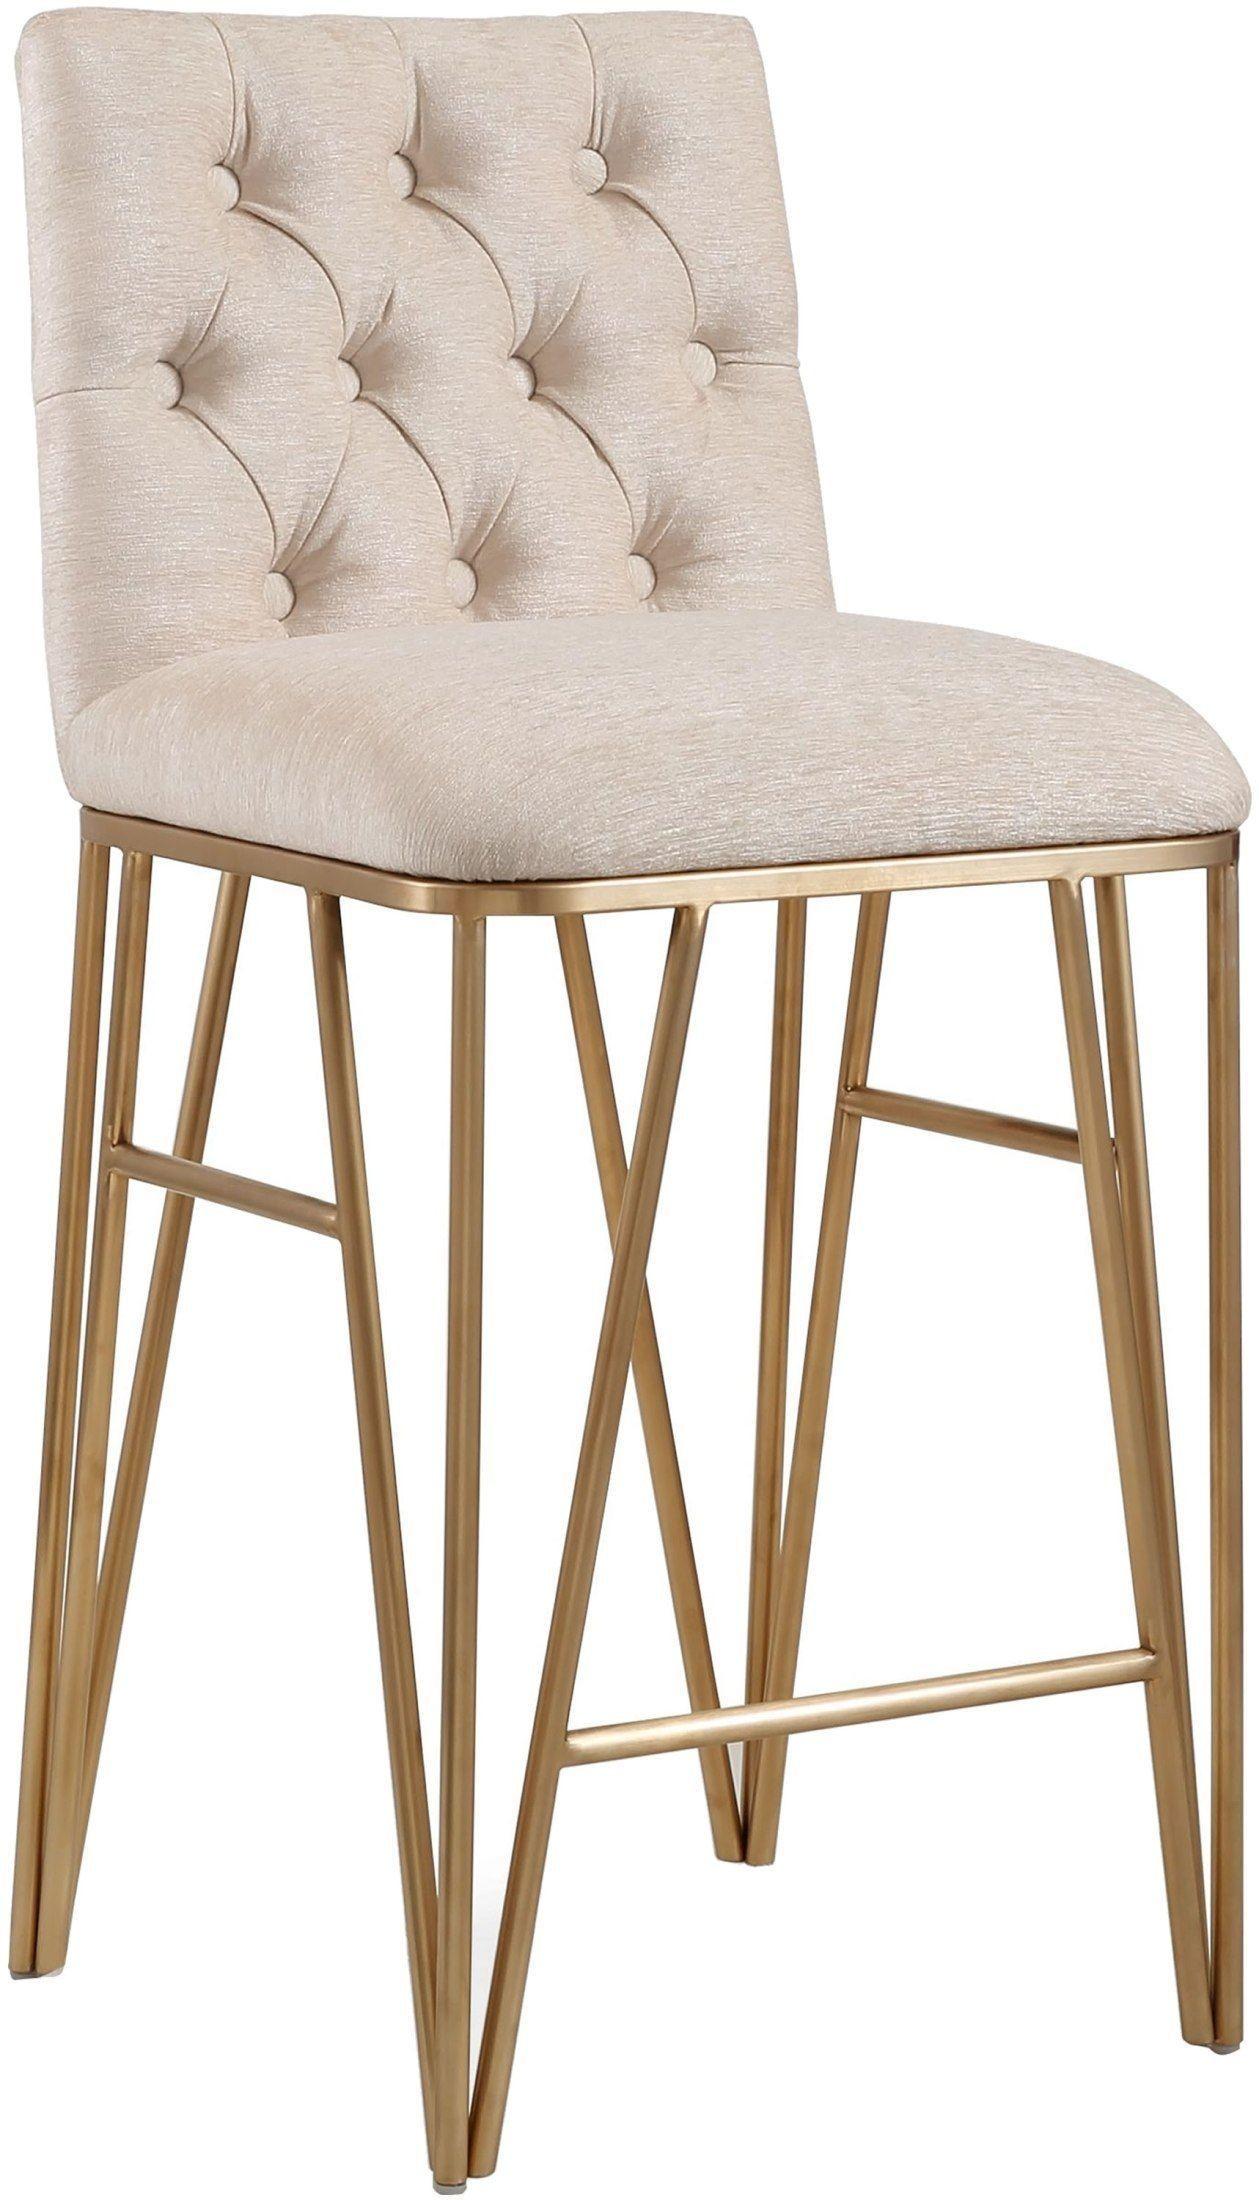 Lexi Cream Textured Velvet Bar Stool D3730 TOV Furniture : tov d3730tov from colemanfurniture.com size 1259 x 2200 jpeg 347kB